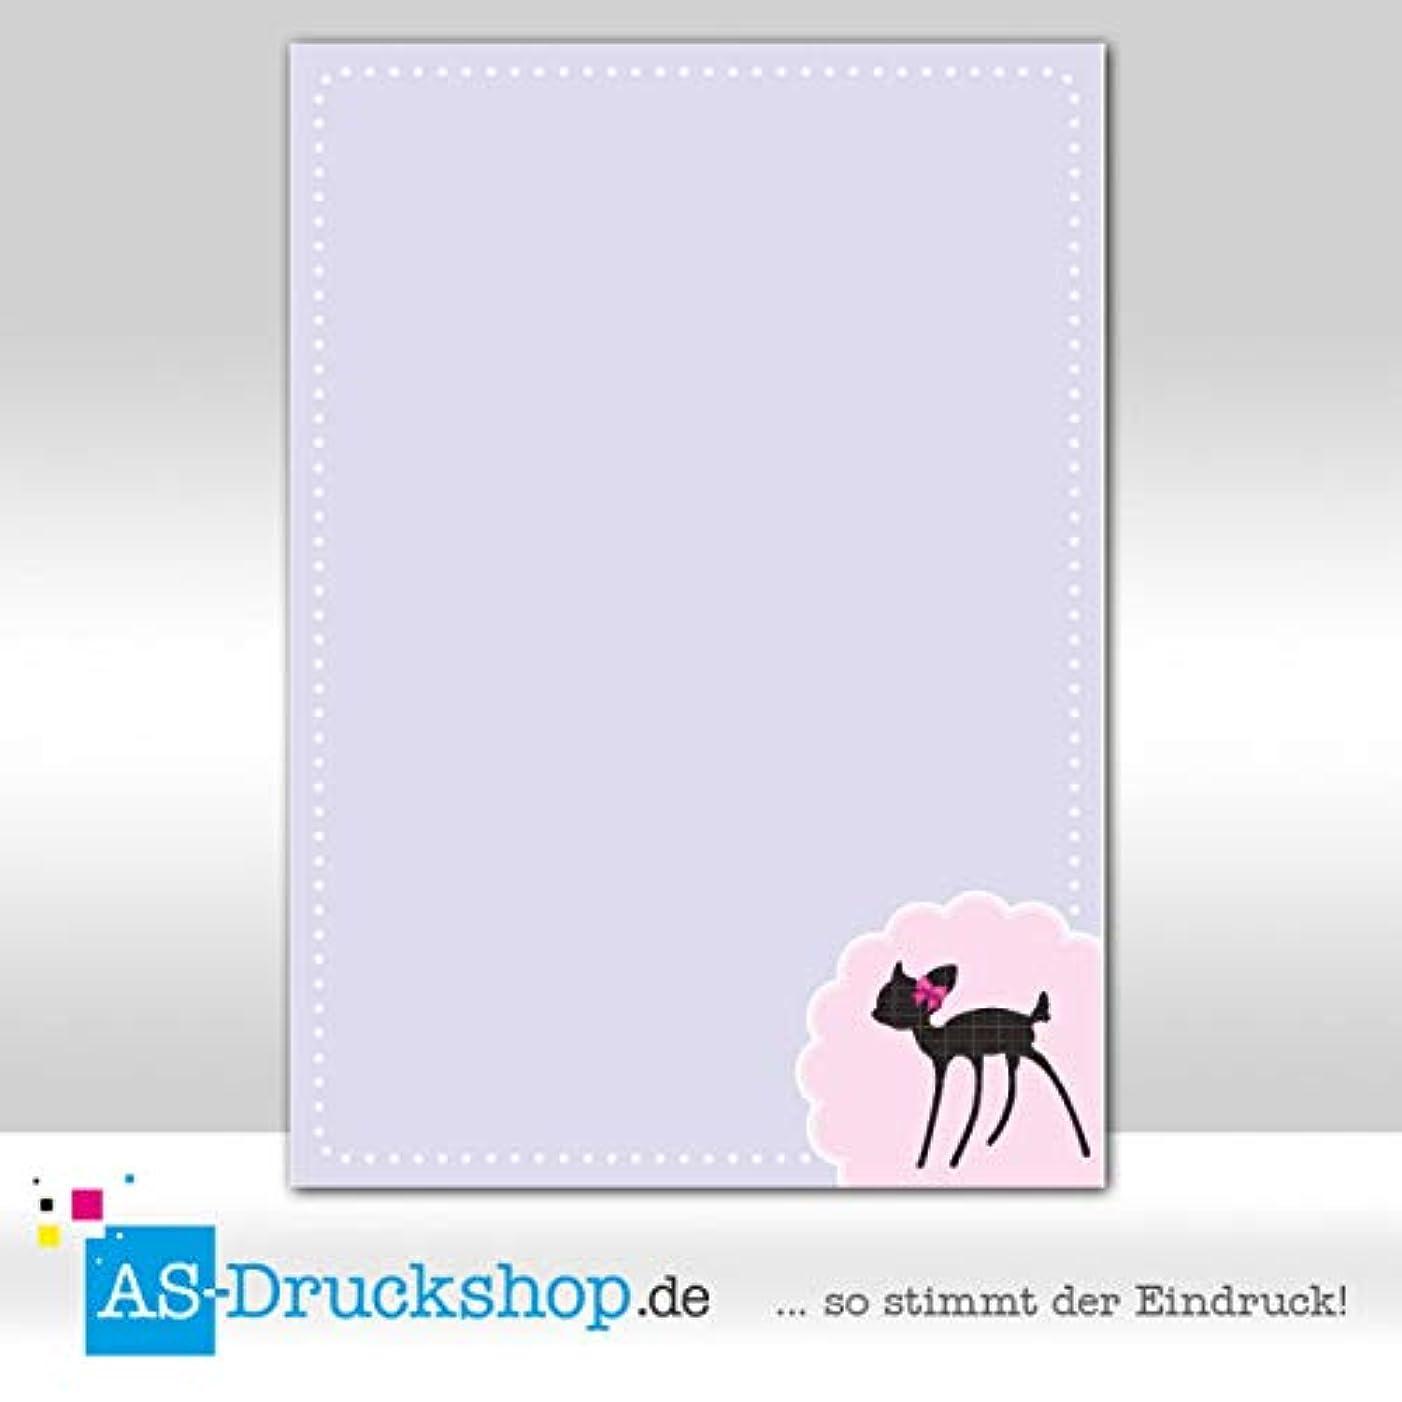 Design Paper Children's Fawn Purple 25 Sheets DIN A4 90 g Offset Paper